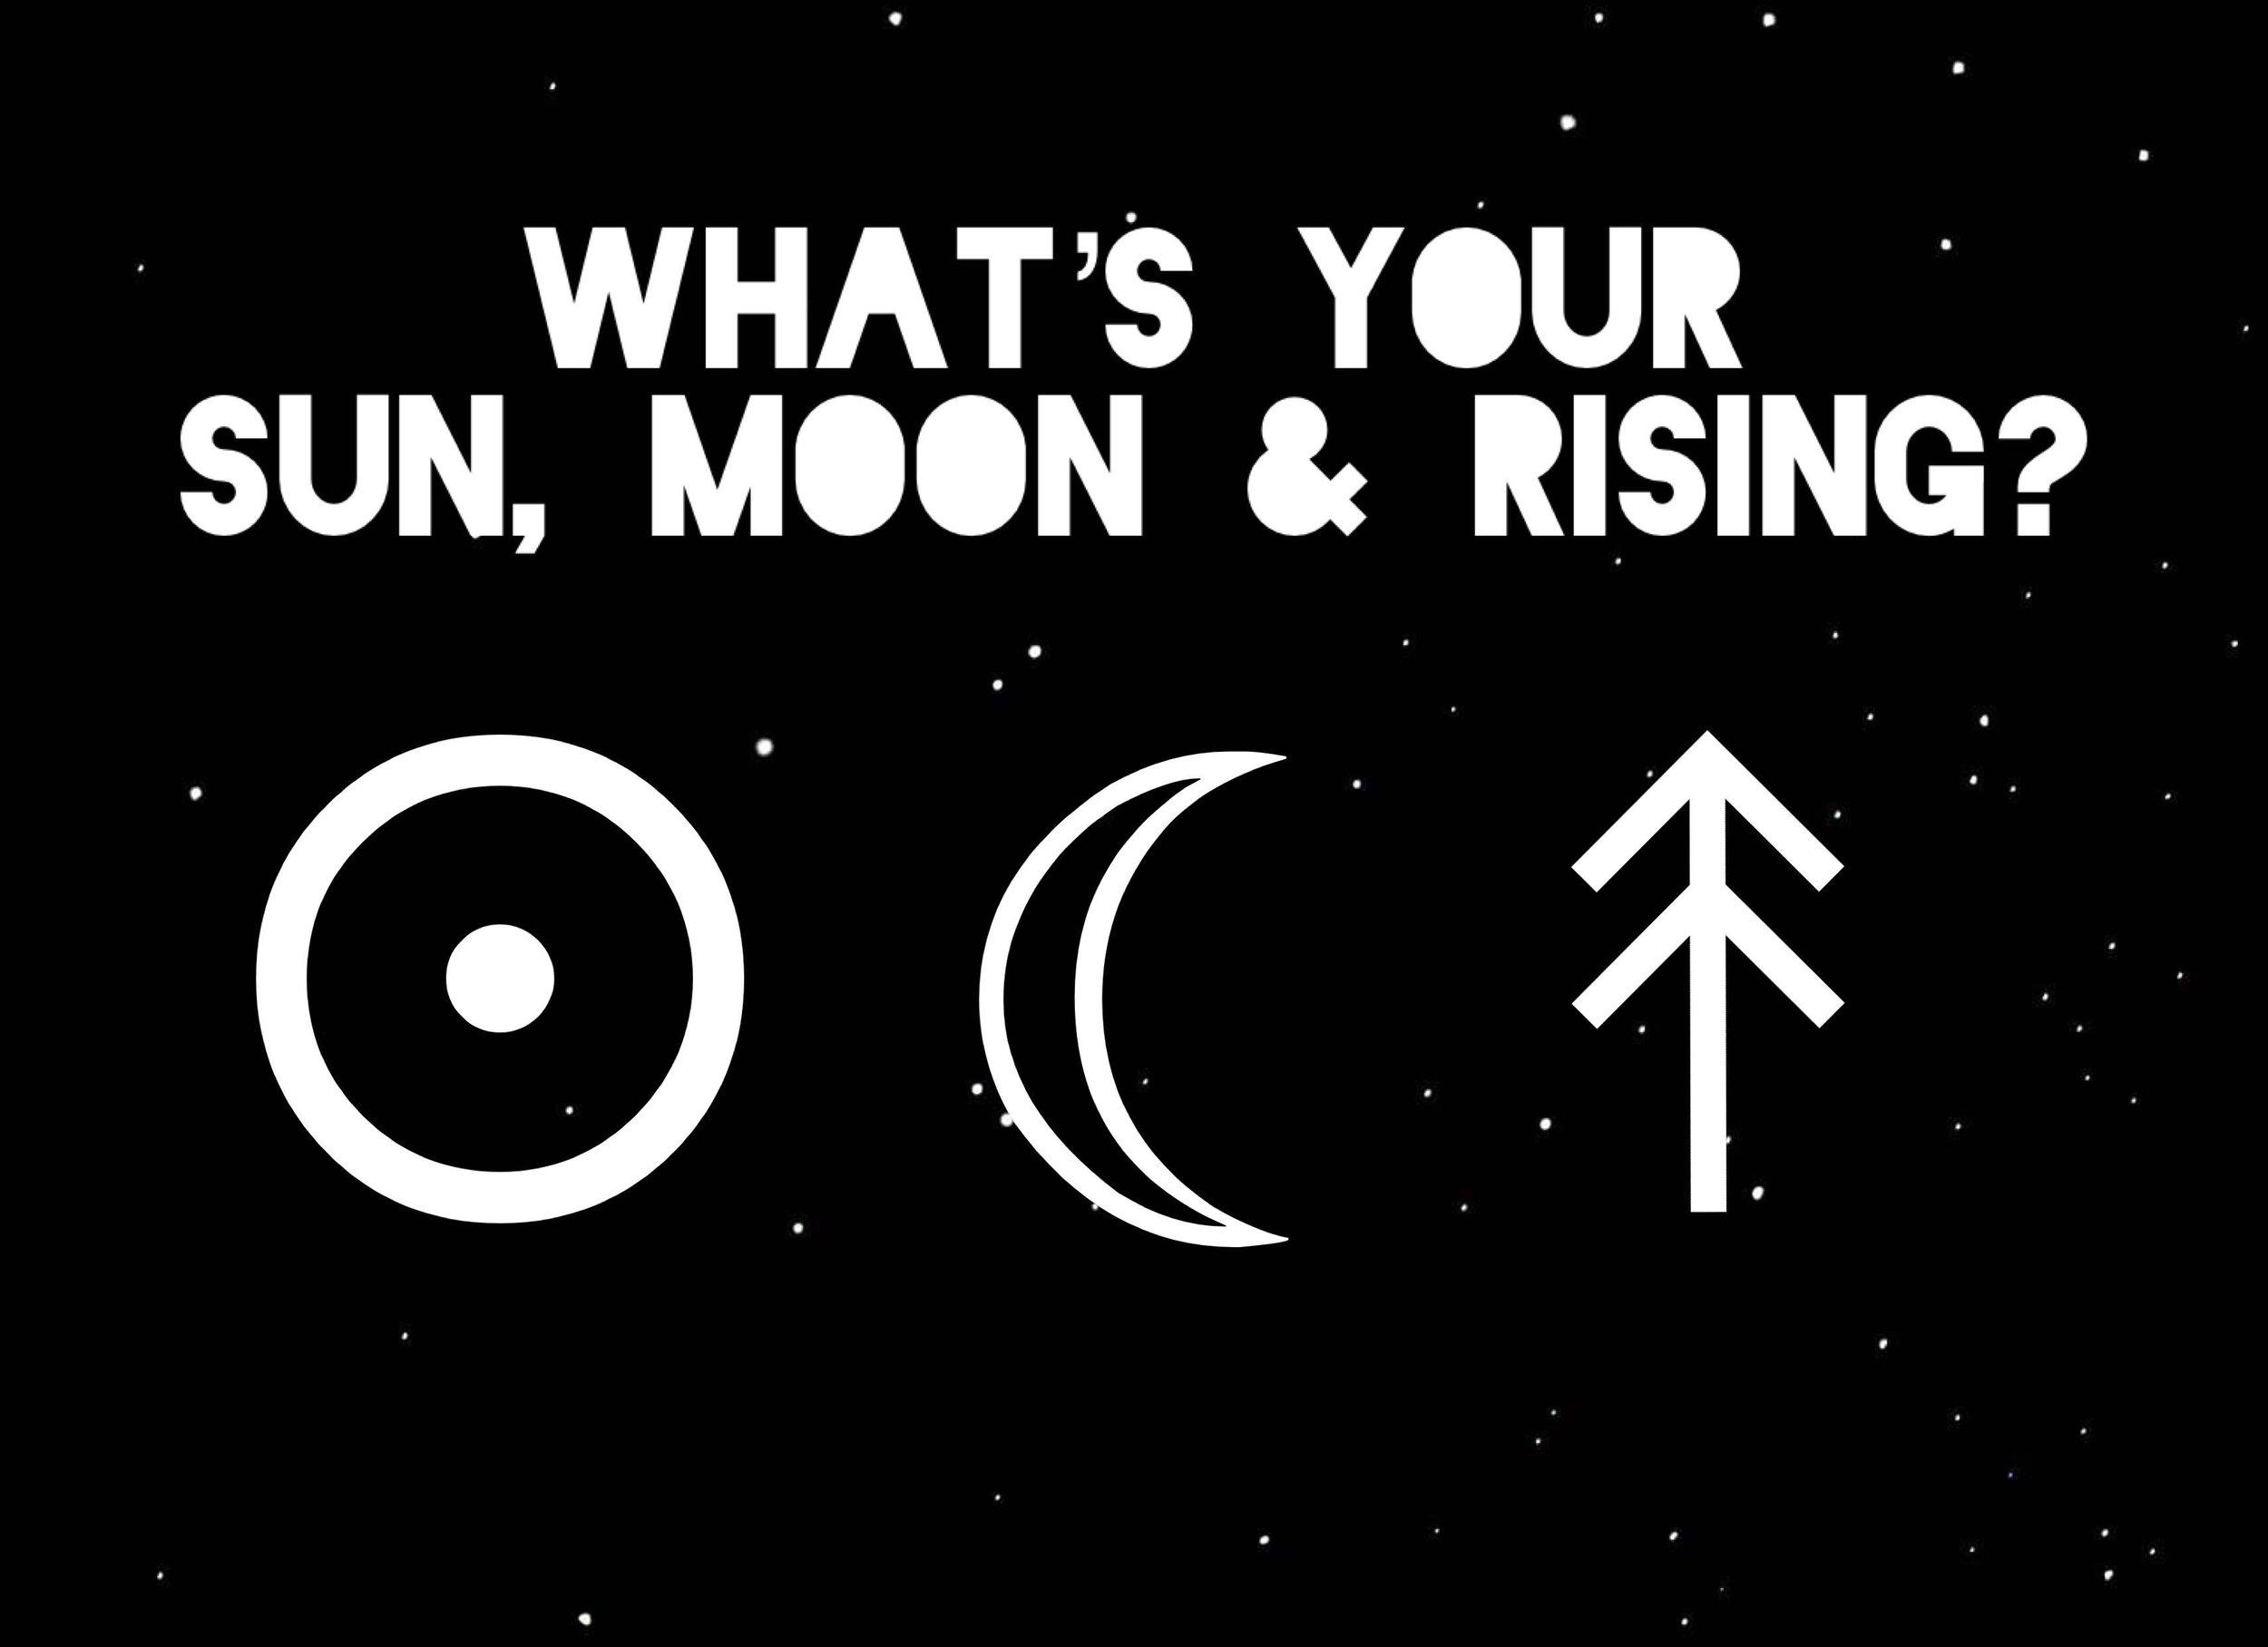 Sun moon rising